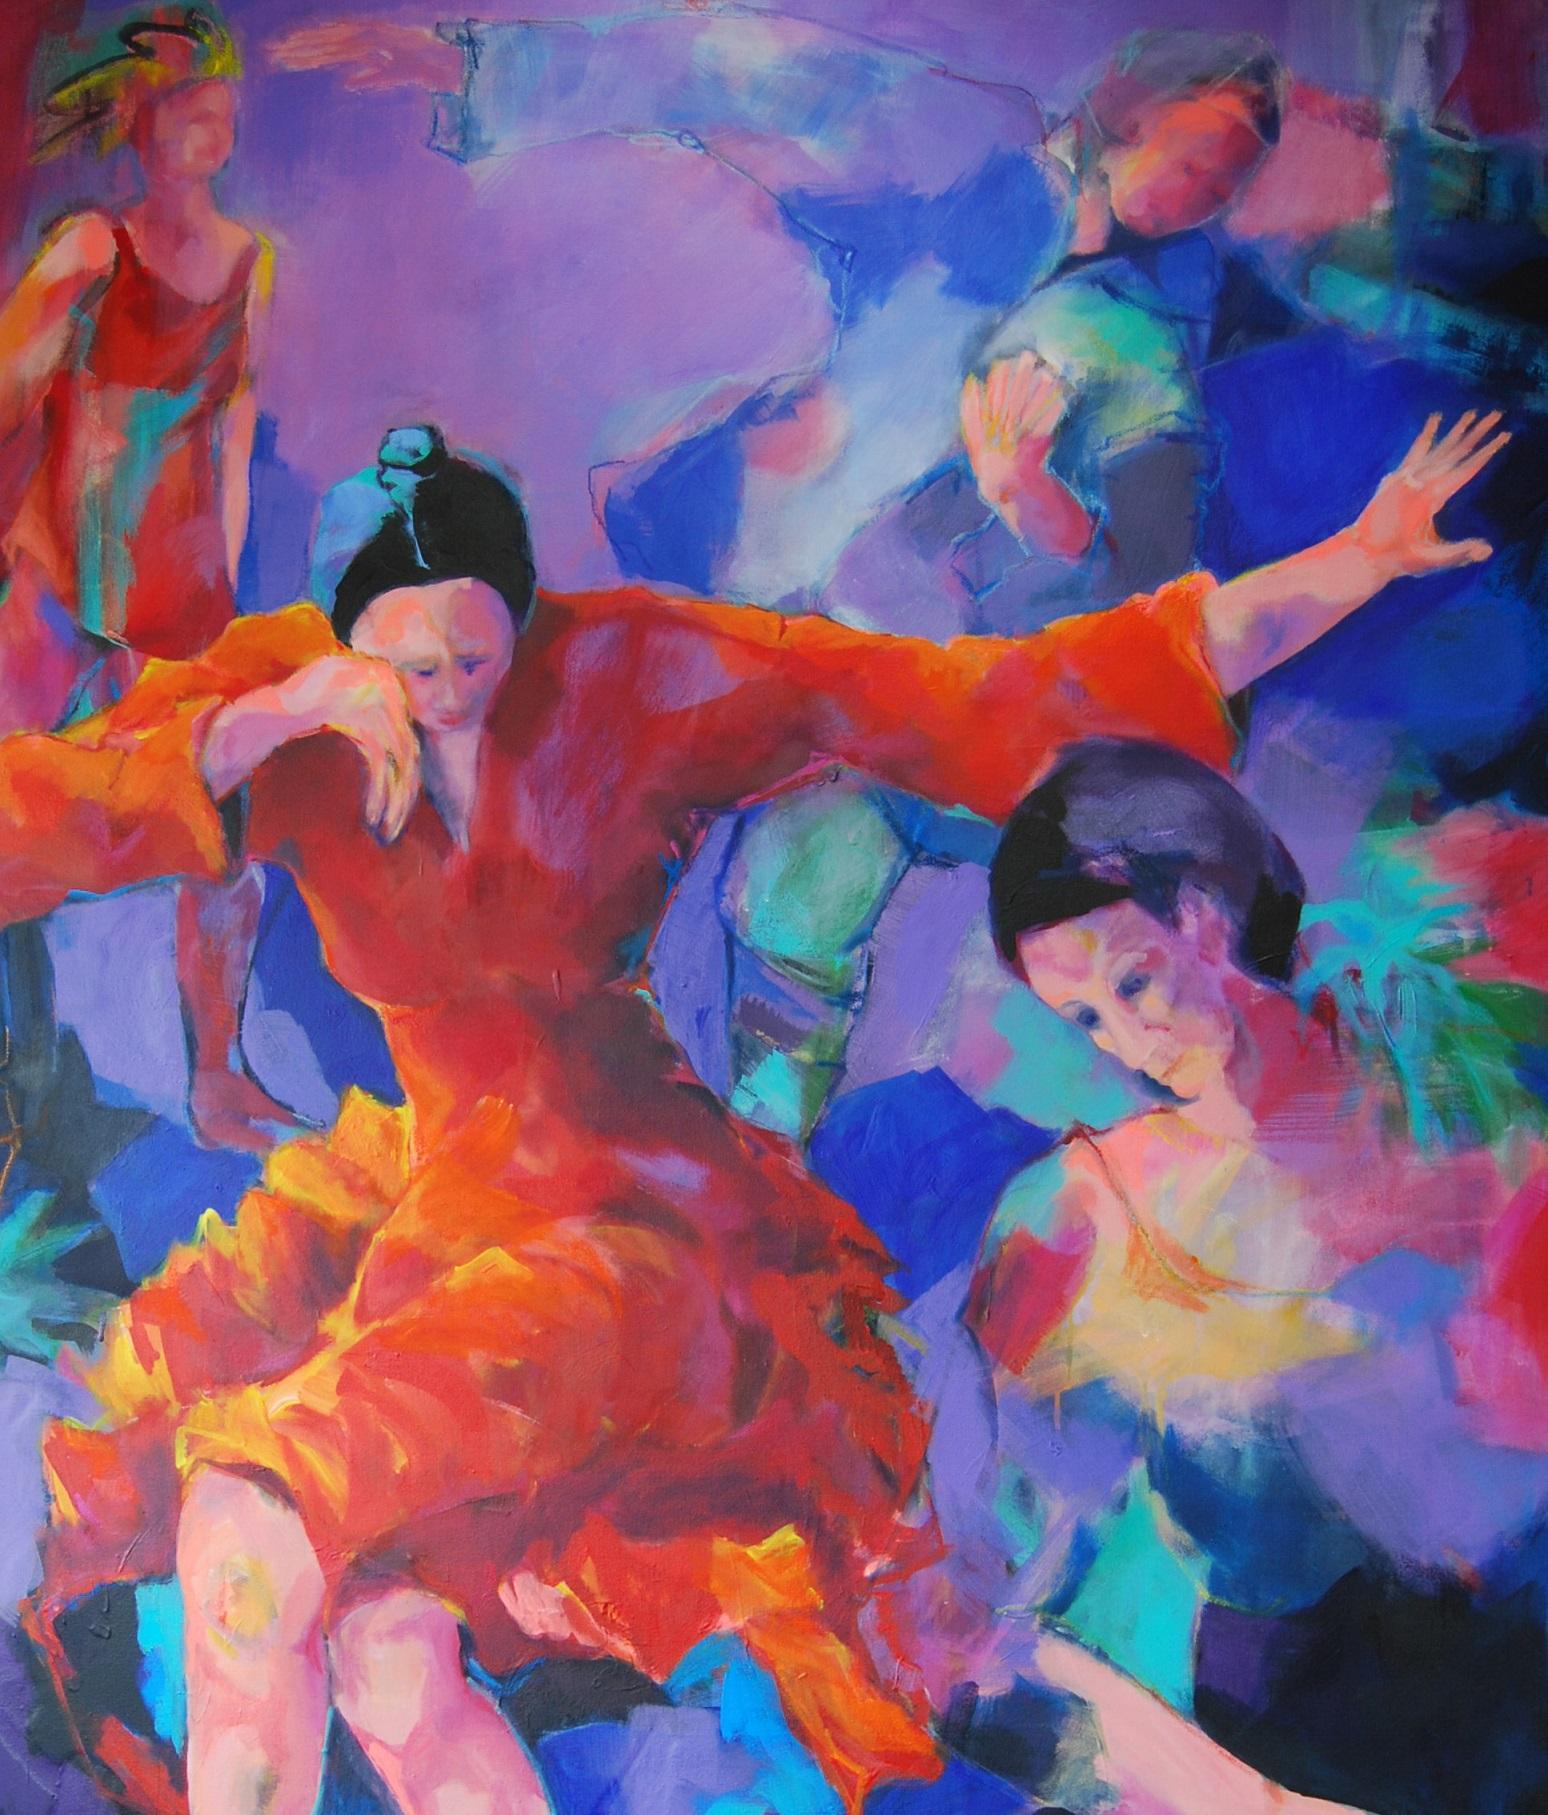 Dance and feel free 1 (Ausschnitt), Acryl auf Leinwand, 200 x 150 cm